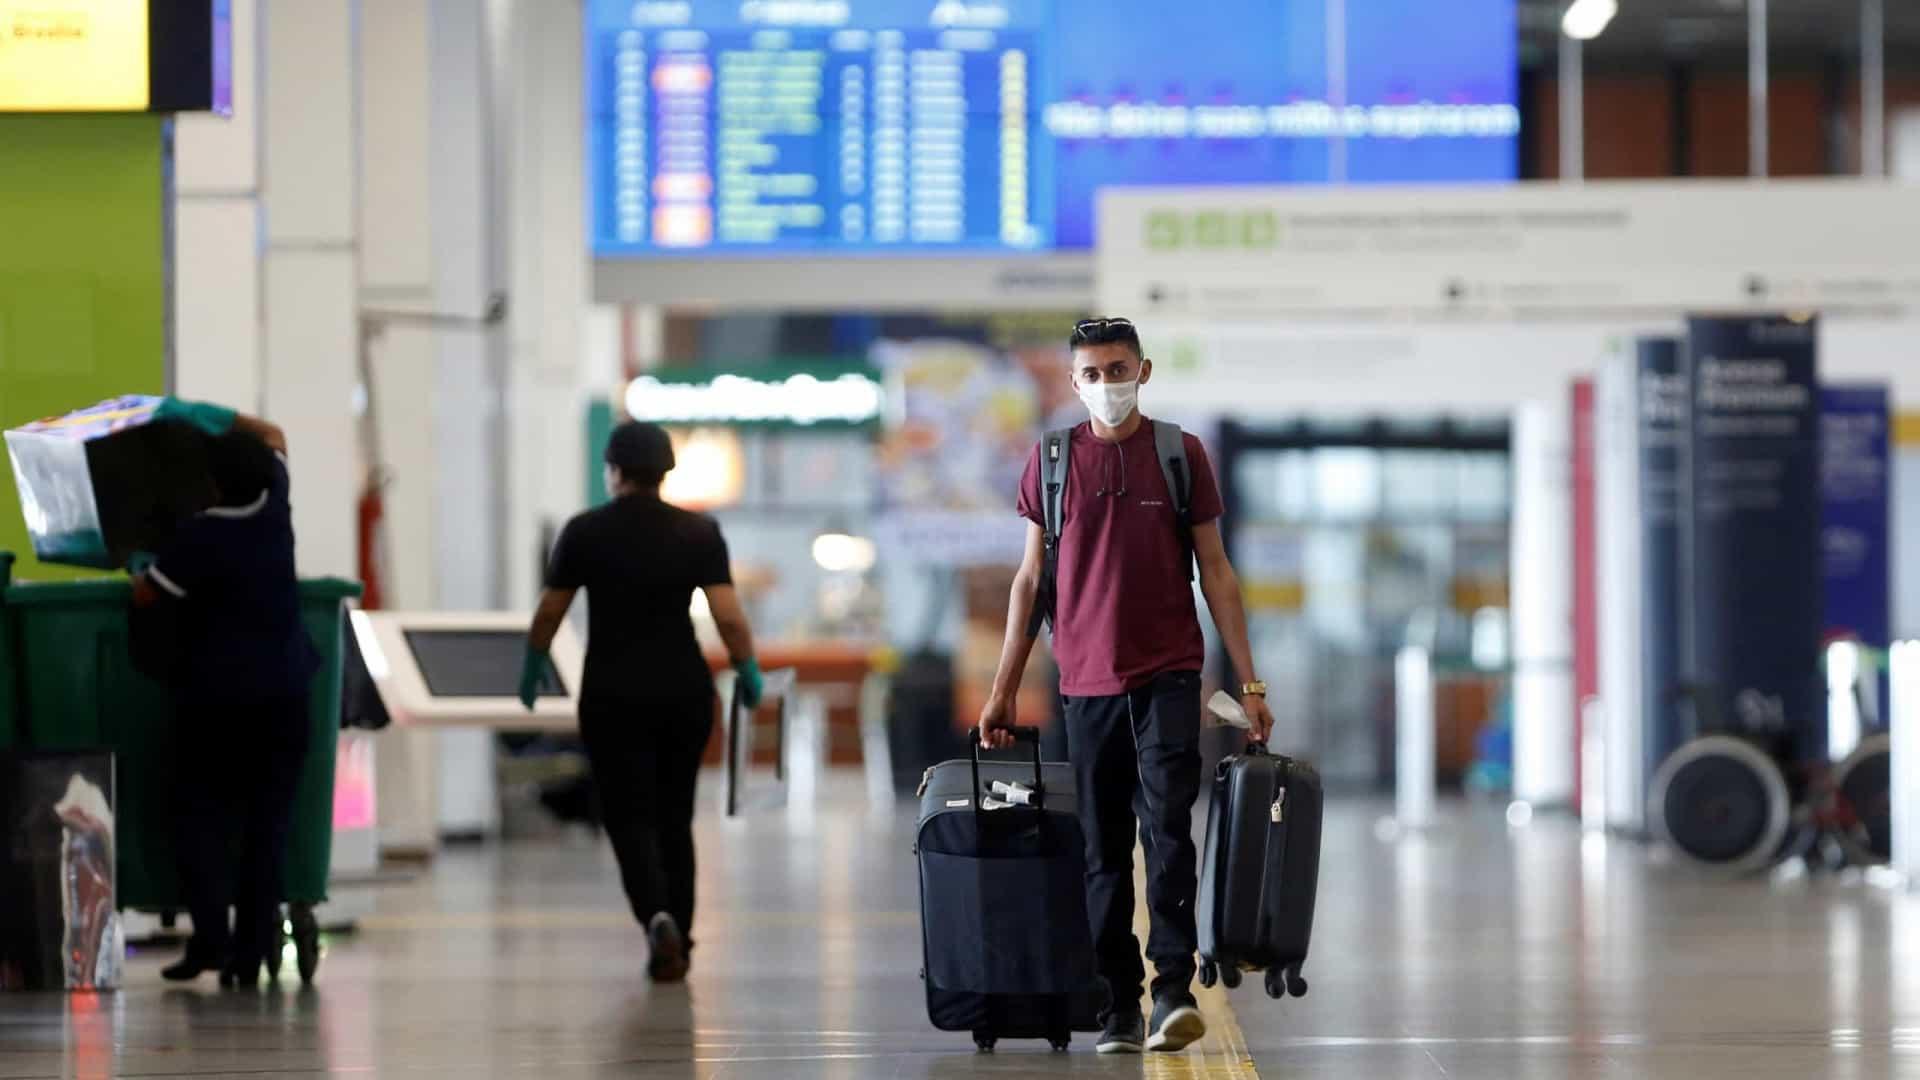 naom 5e7ee91f05ea1 - Por conta da pandemia, turismo apresenta prejuízo de R$ 41,6 bilhões, segundo FecomercioSP